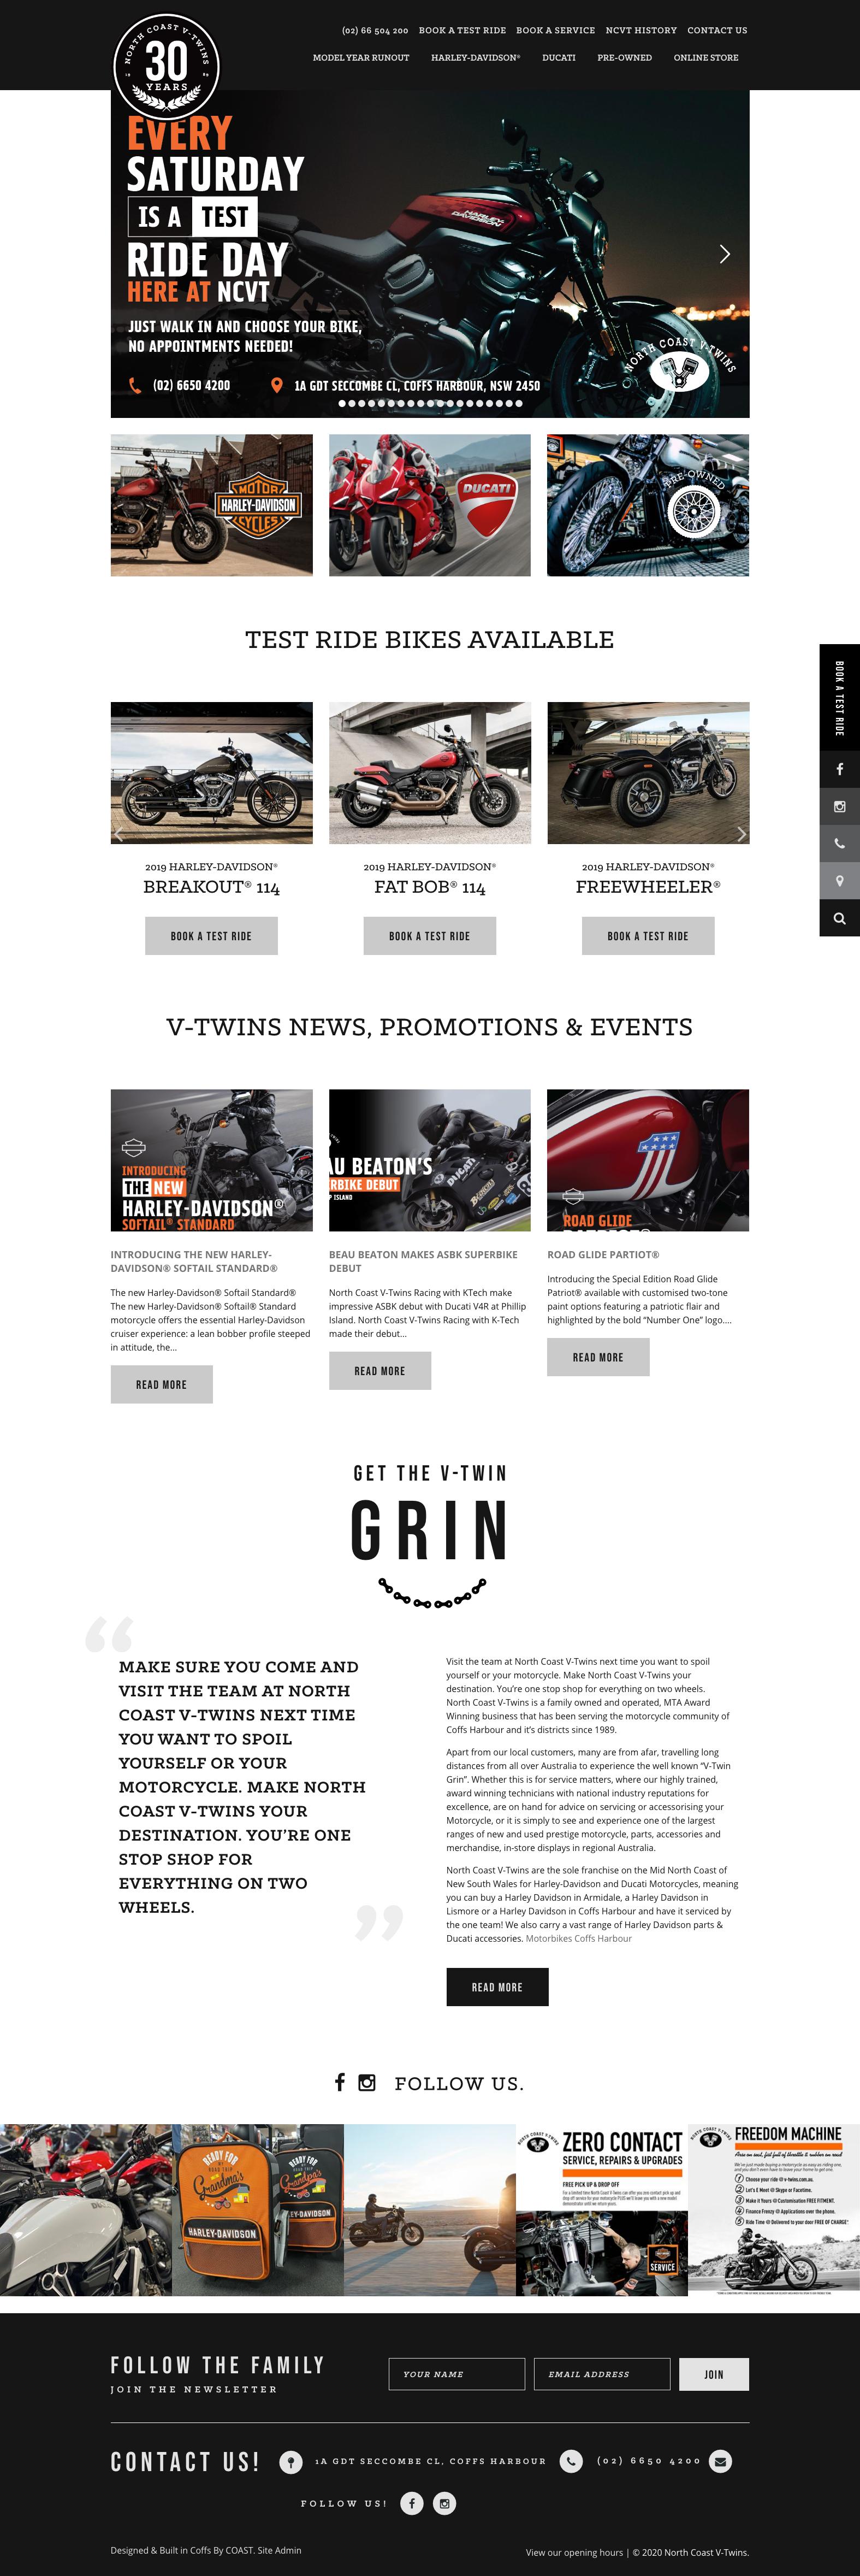 Website Design & Development for North Coast V-Twins